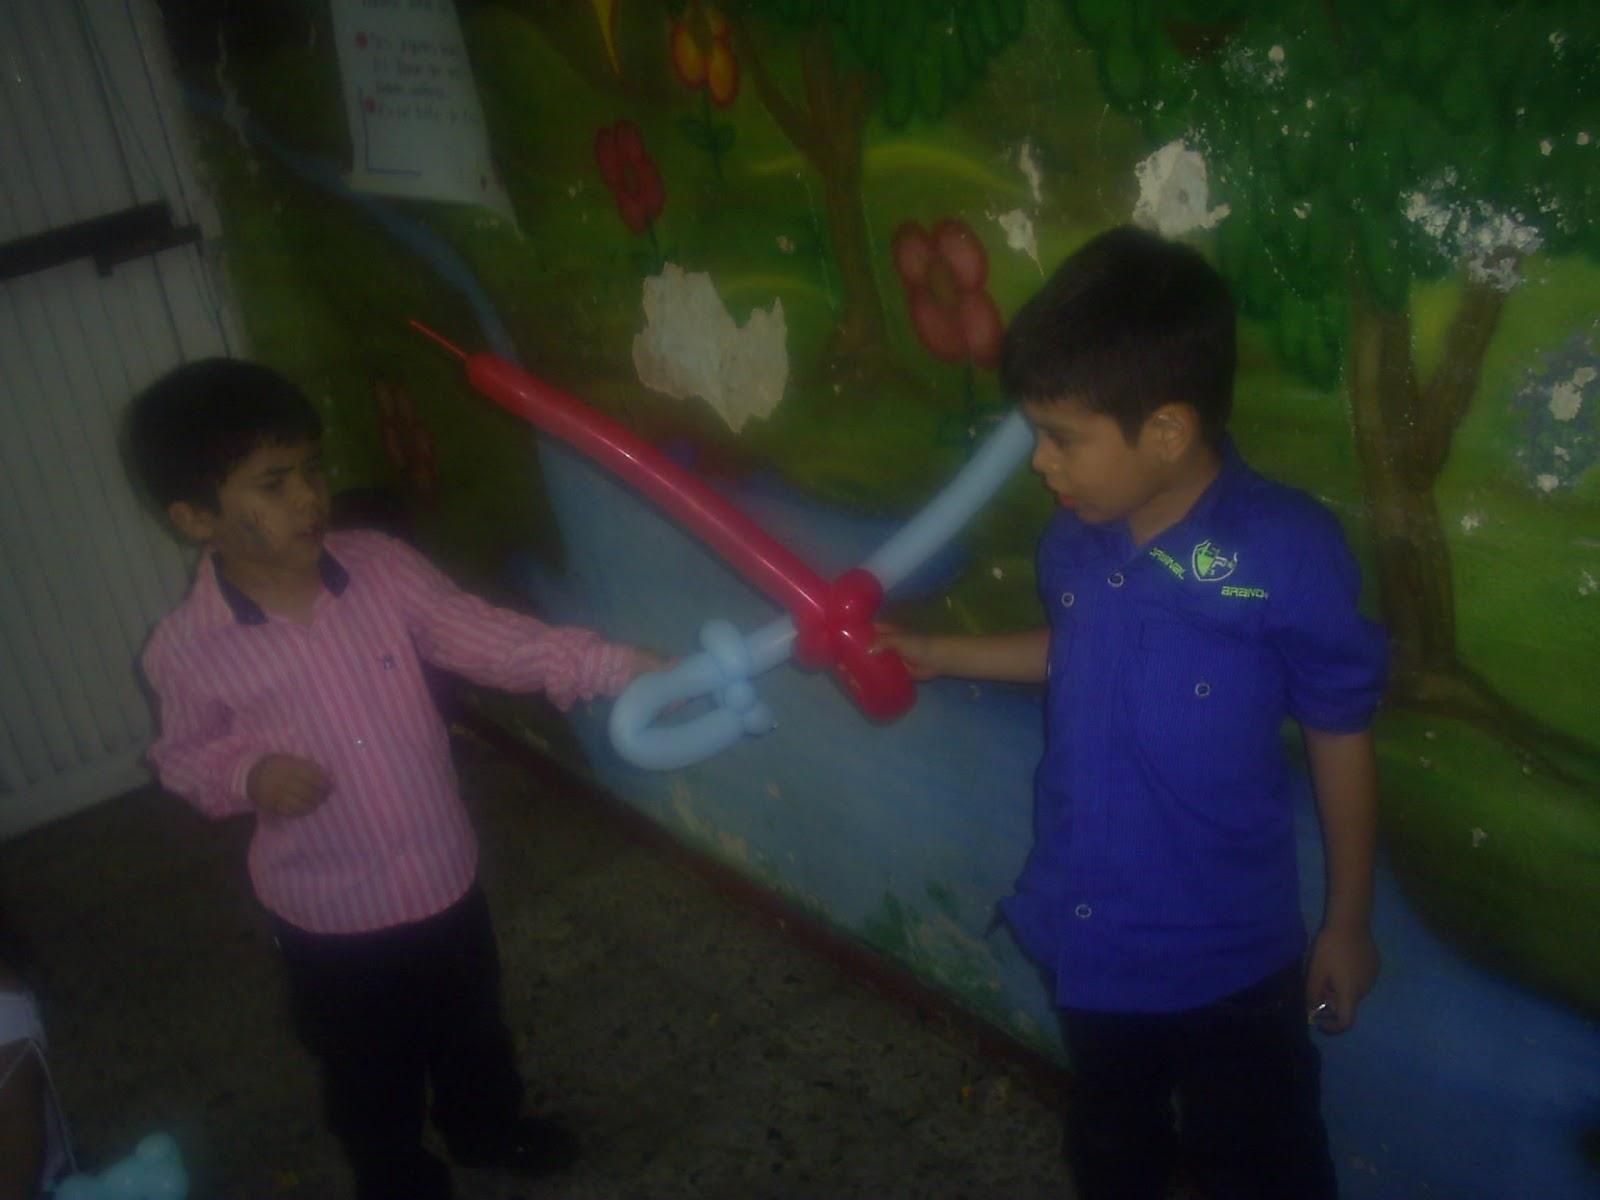 Globoflexia fiestas infantiles medellin revoltosos for Cascanueces jardin infantil medellin